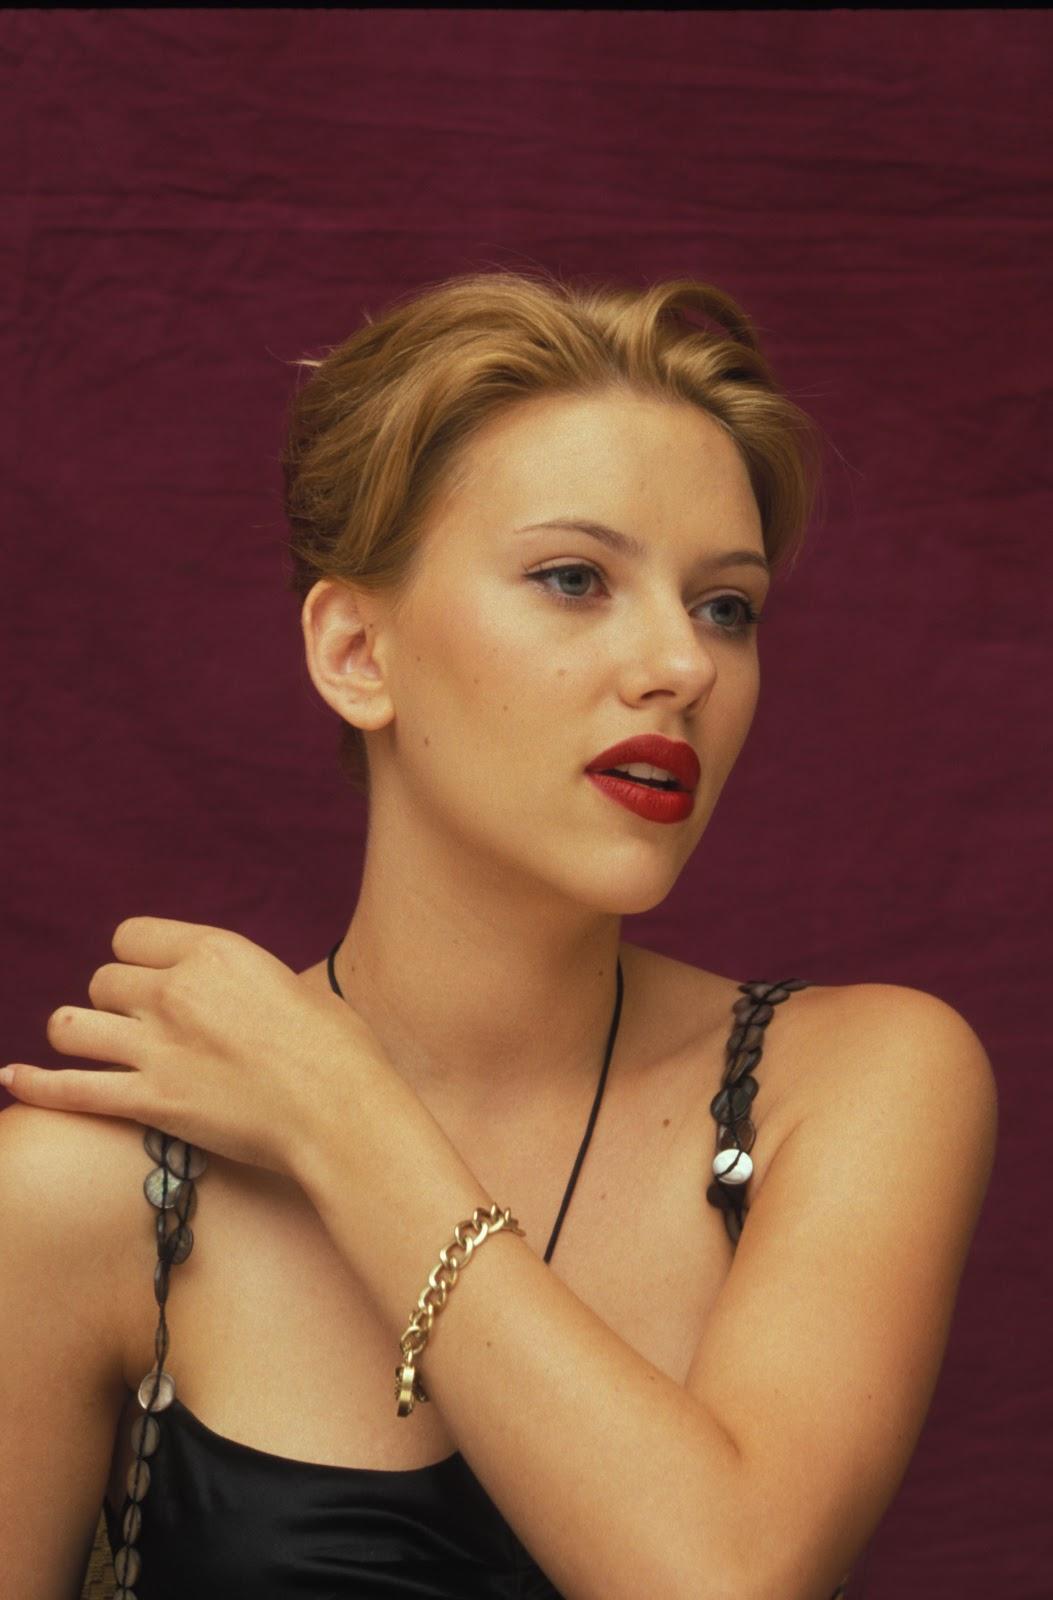 Scarlett johansson pictures gallery 21 film actresses - Scarlett johansson blogspot ...